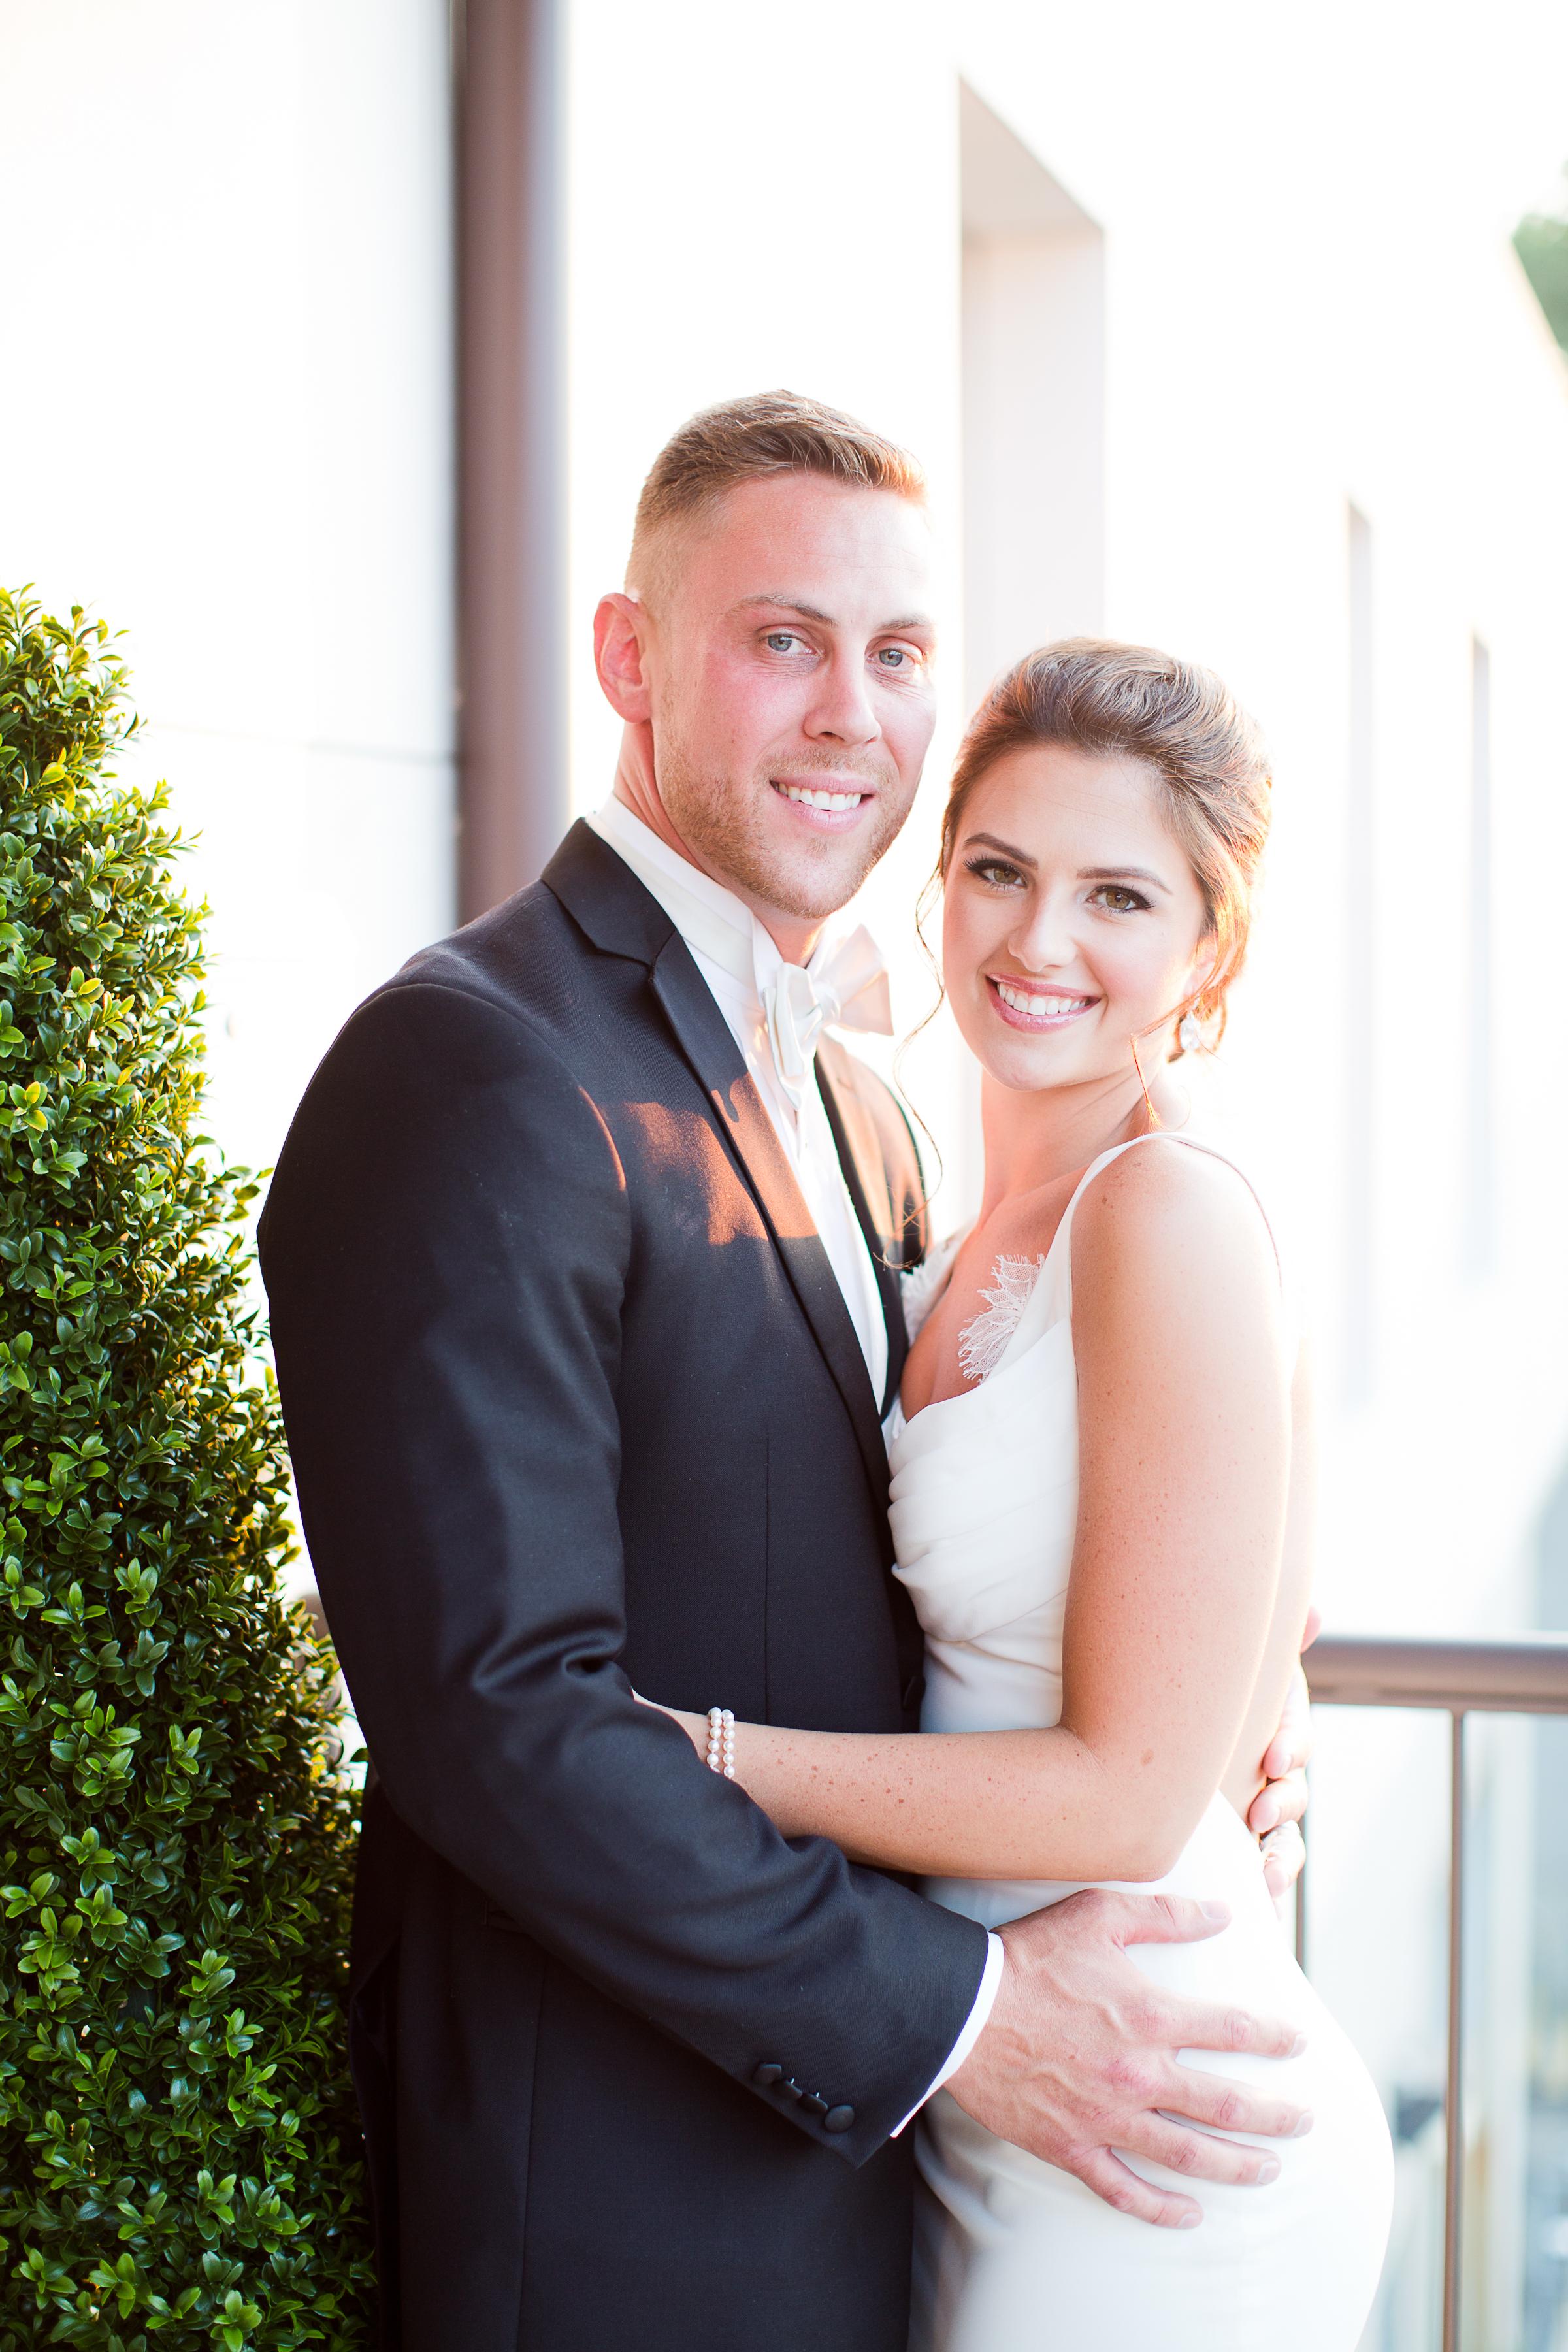 Melissa Kruse Photography - Genna + Anthony The Loading Dock Stamford CT Wedding-753.jpg